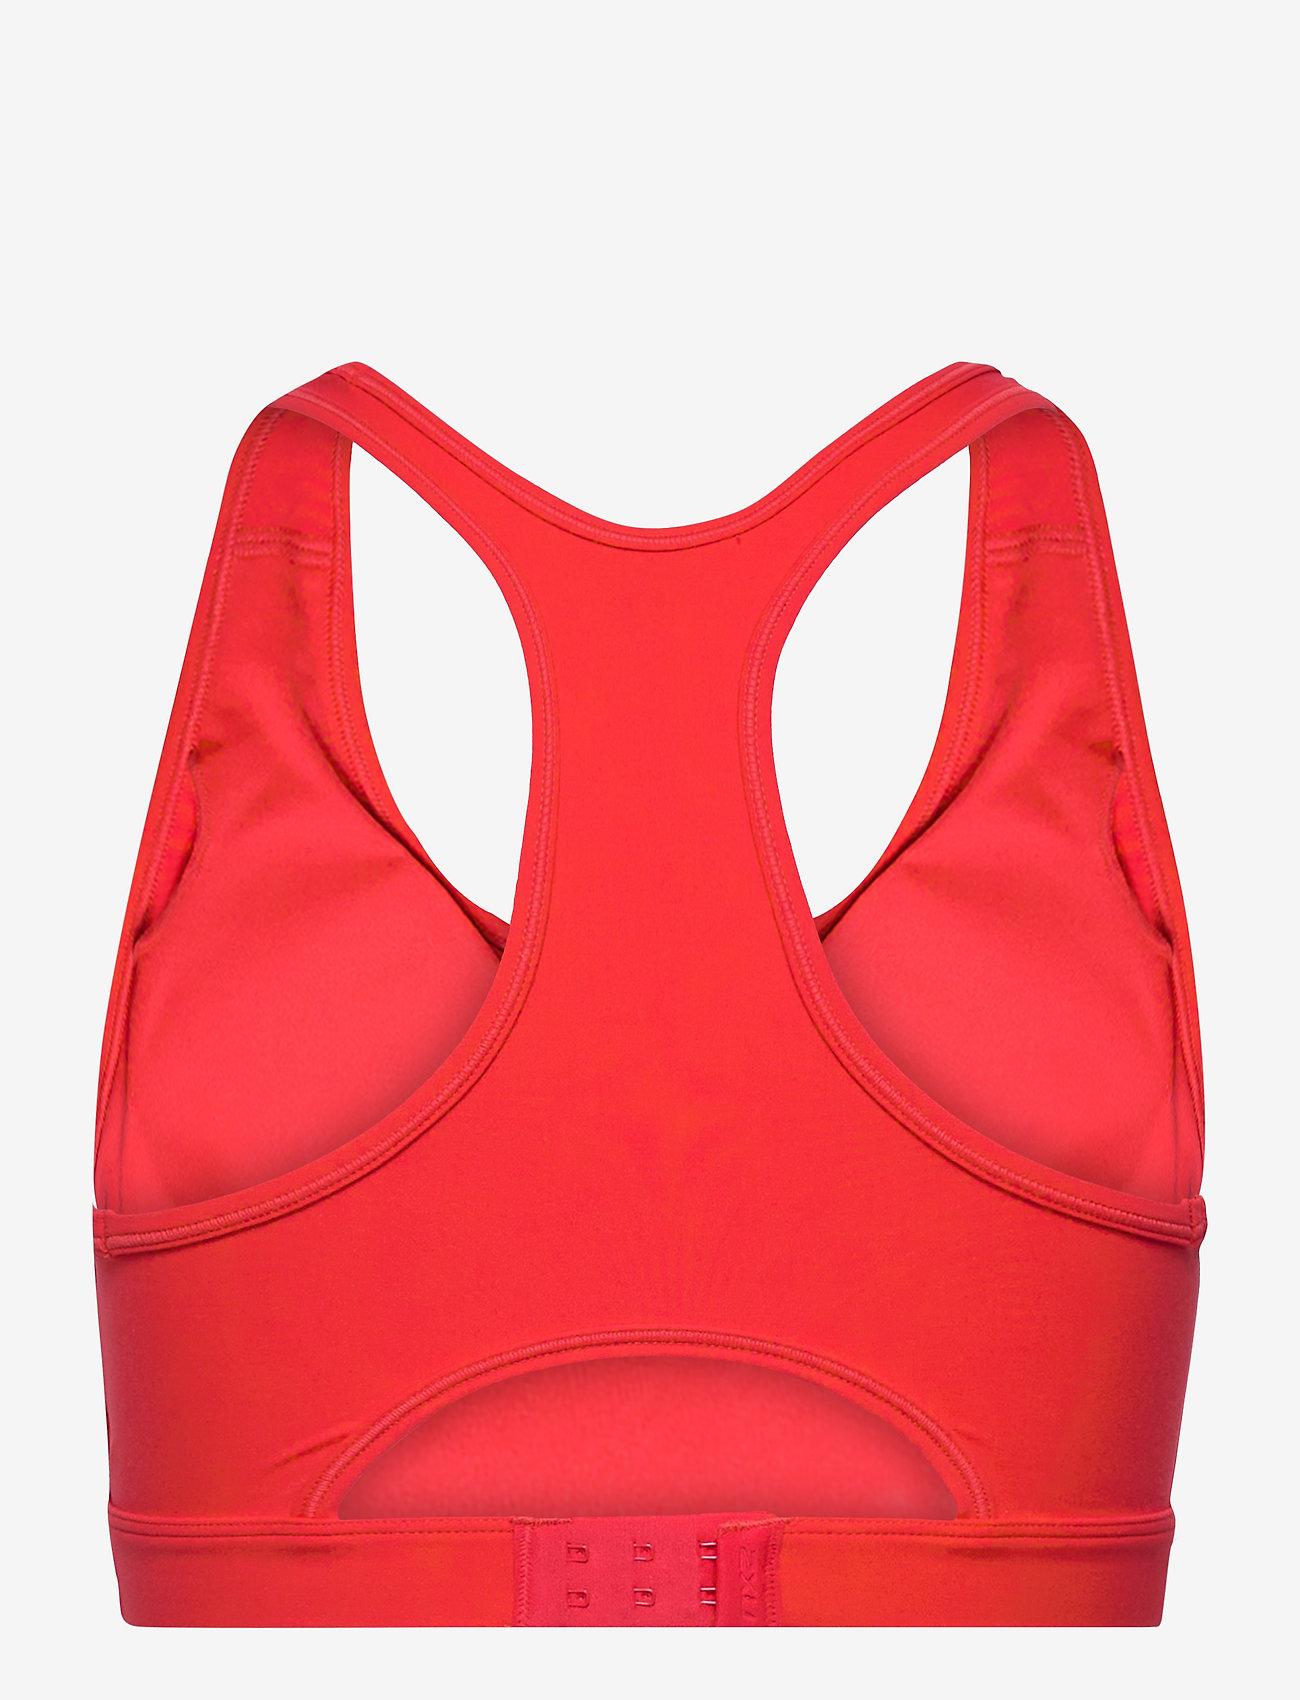 2XU - MOTION RACERBACK CROP - sport bras: medium - high risk red/white - 1